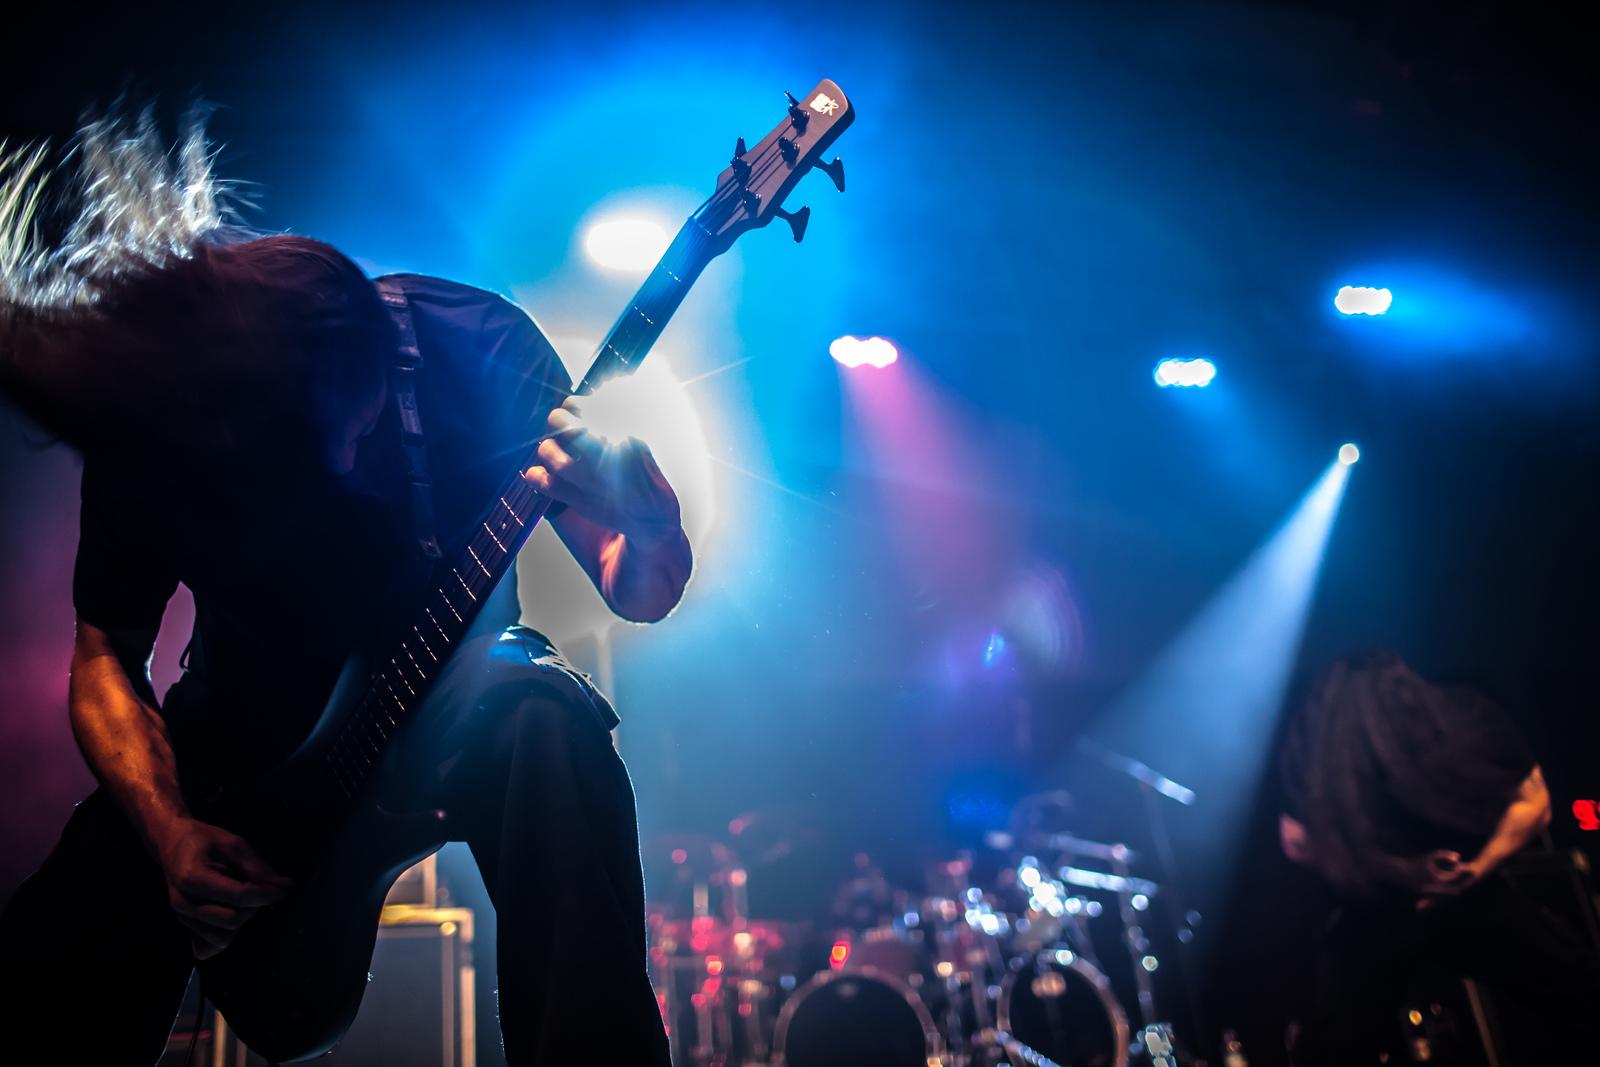 Pics photos rock concert background - Rock Concert Background Hard Rock Concert Concerts